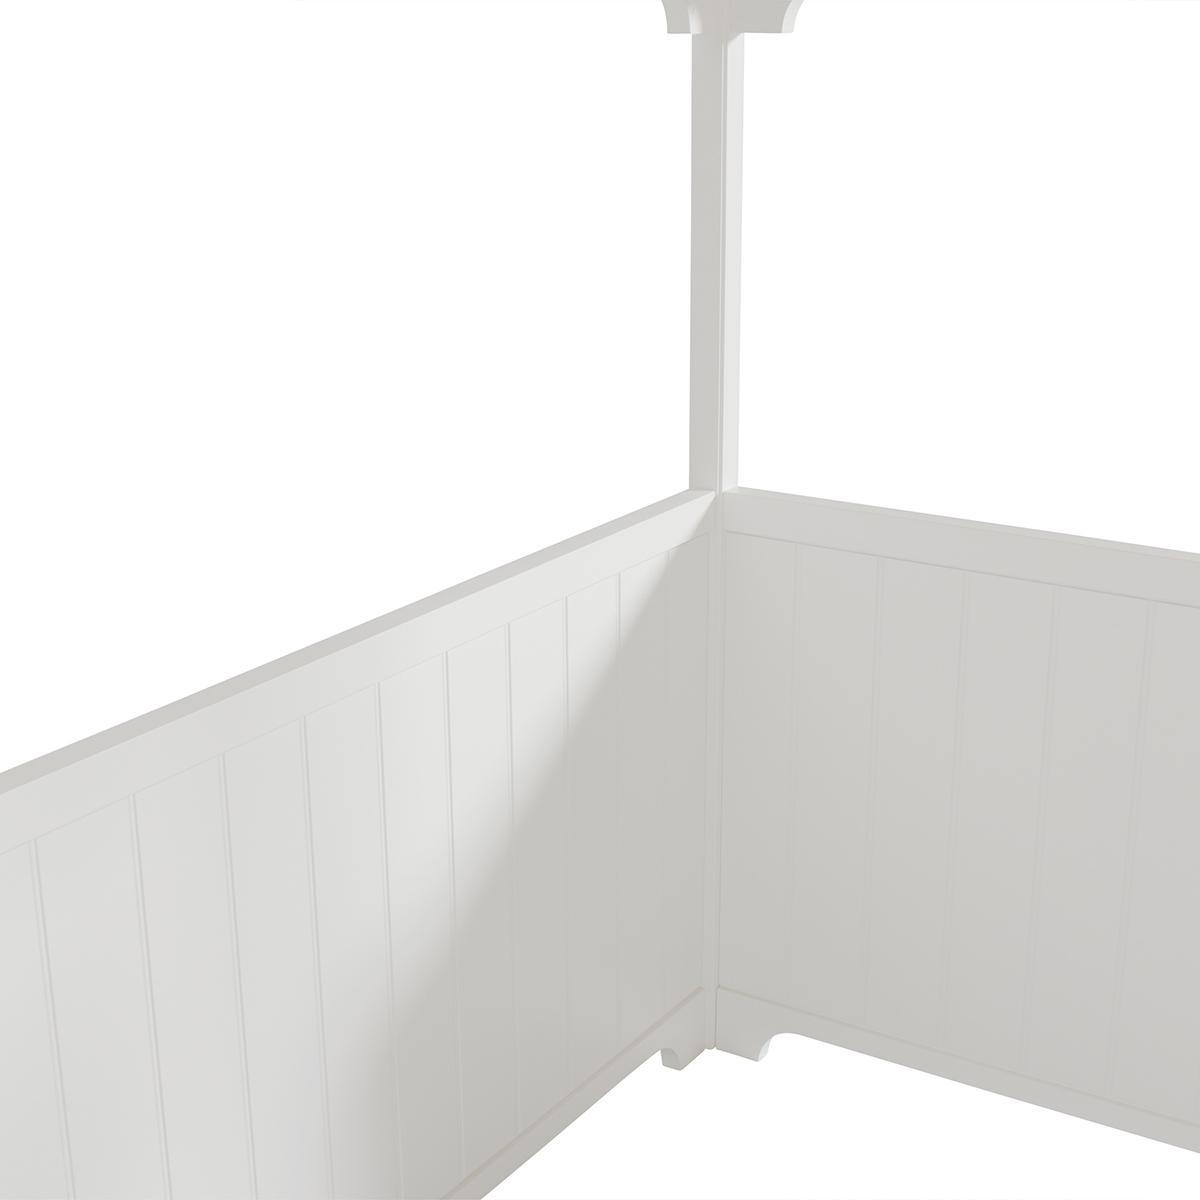 Lit mezzanine 90x200 cm SEASIDE CLASSIC Oliver Furniture blanc